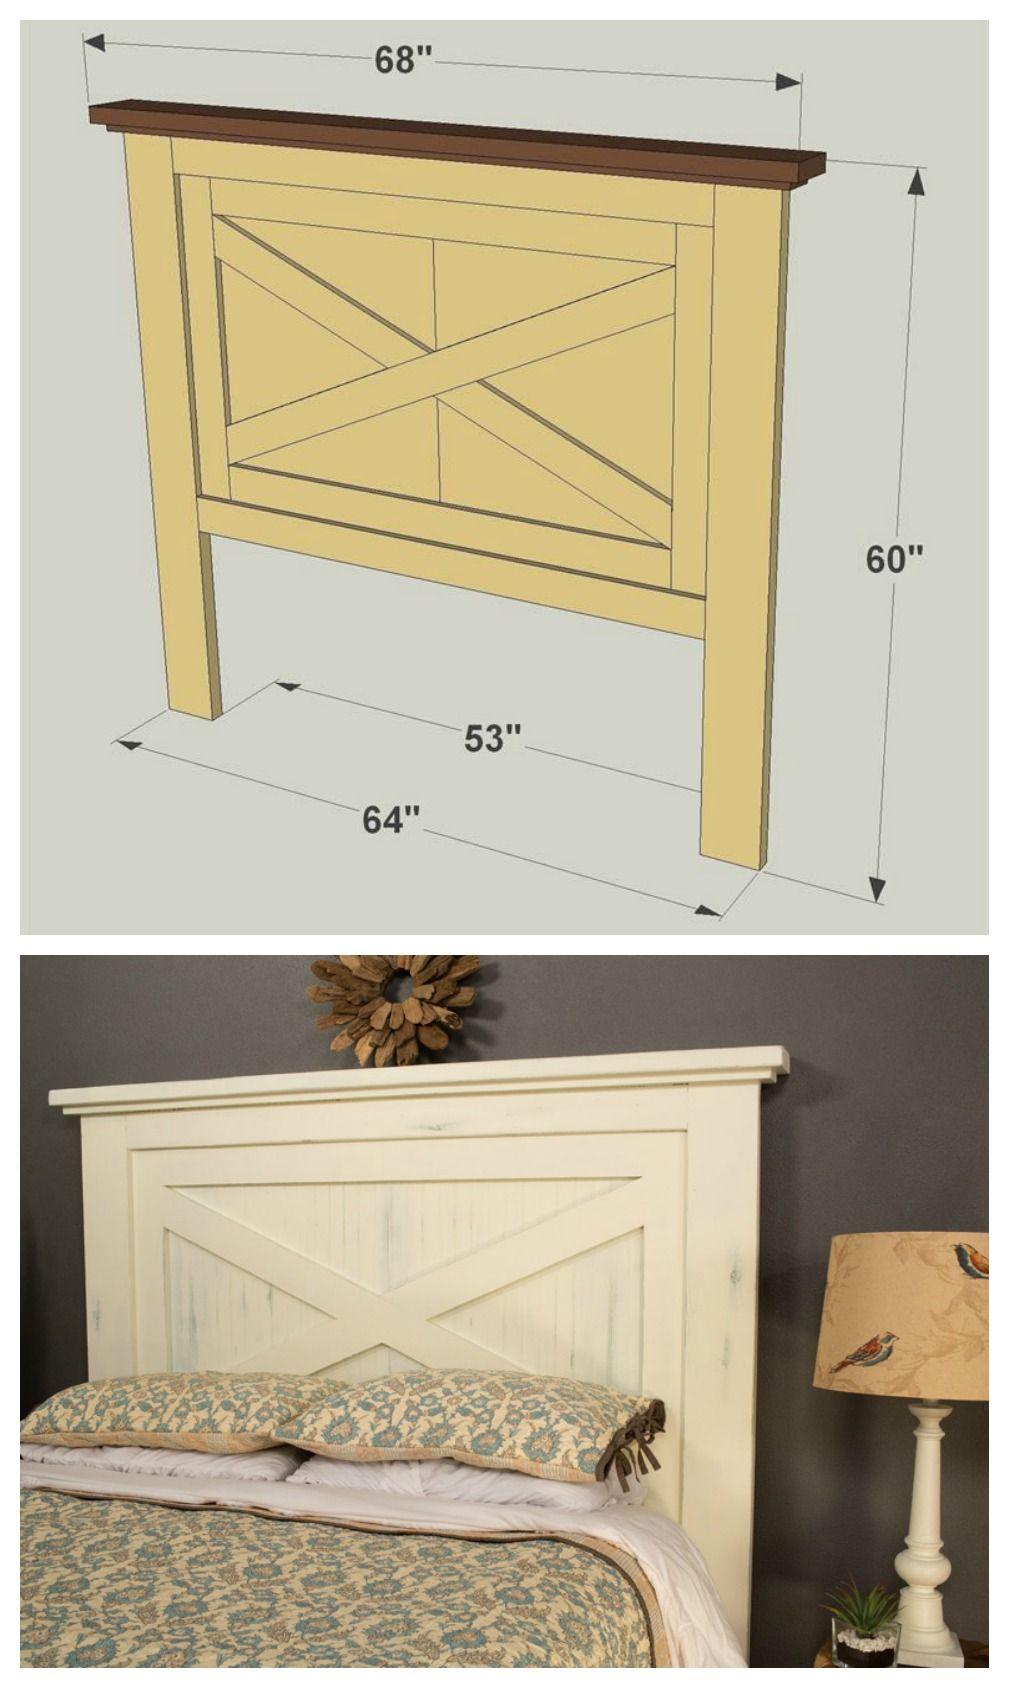 Beautiful Indoor & Outdoor Furniture & Crafting Plans | Camas ...